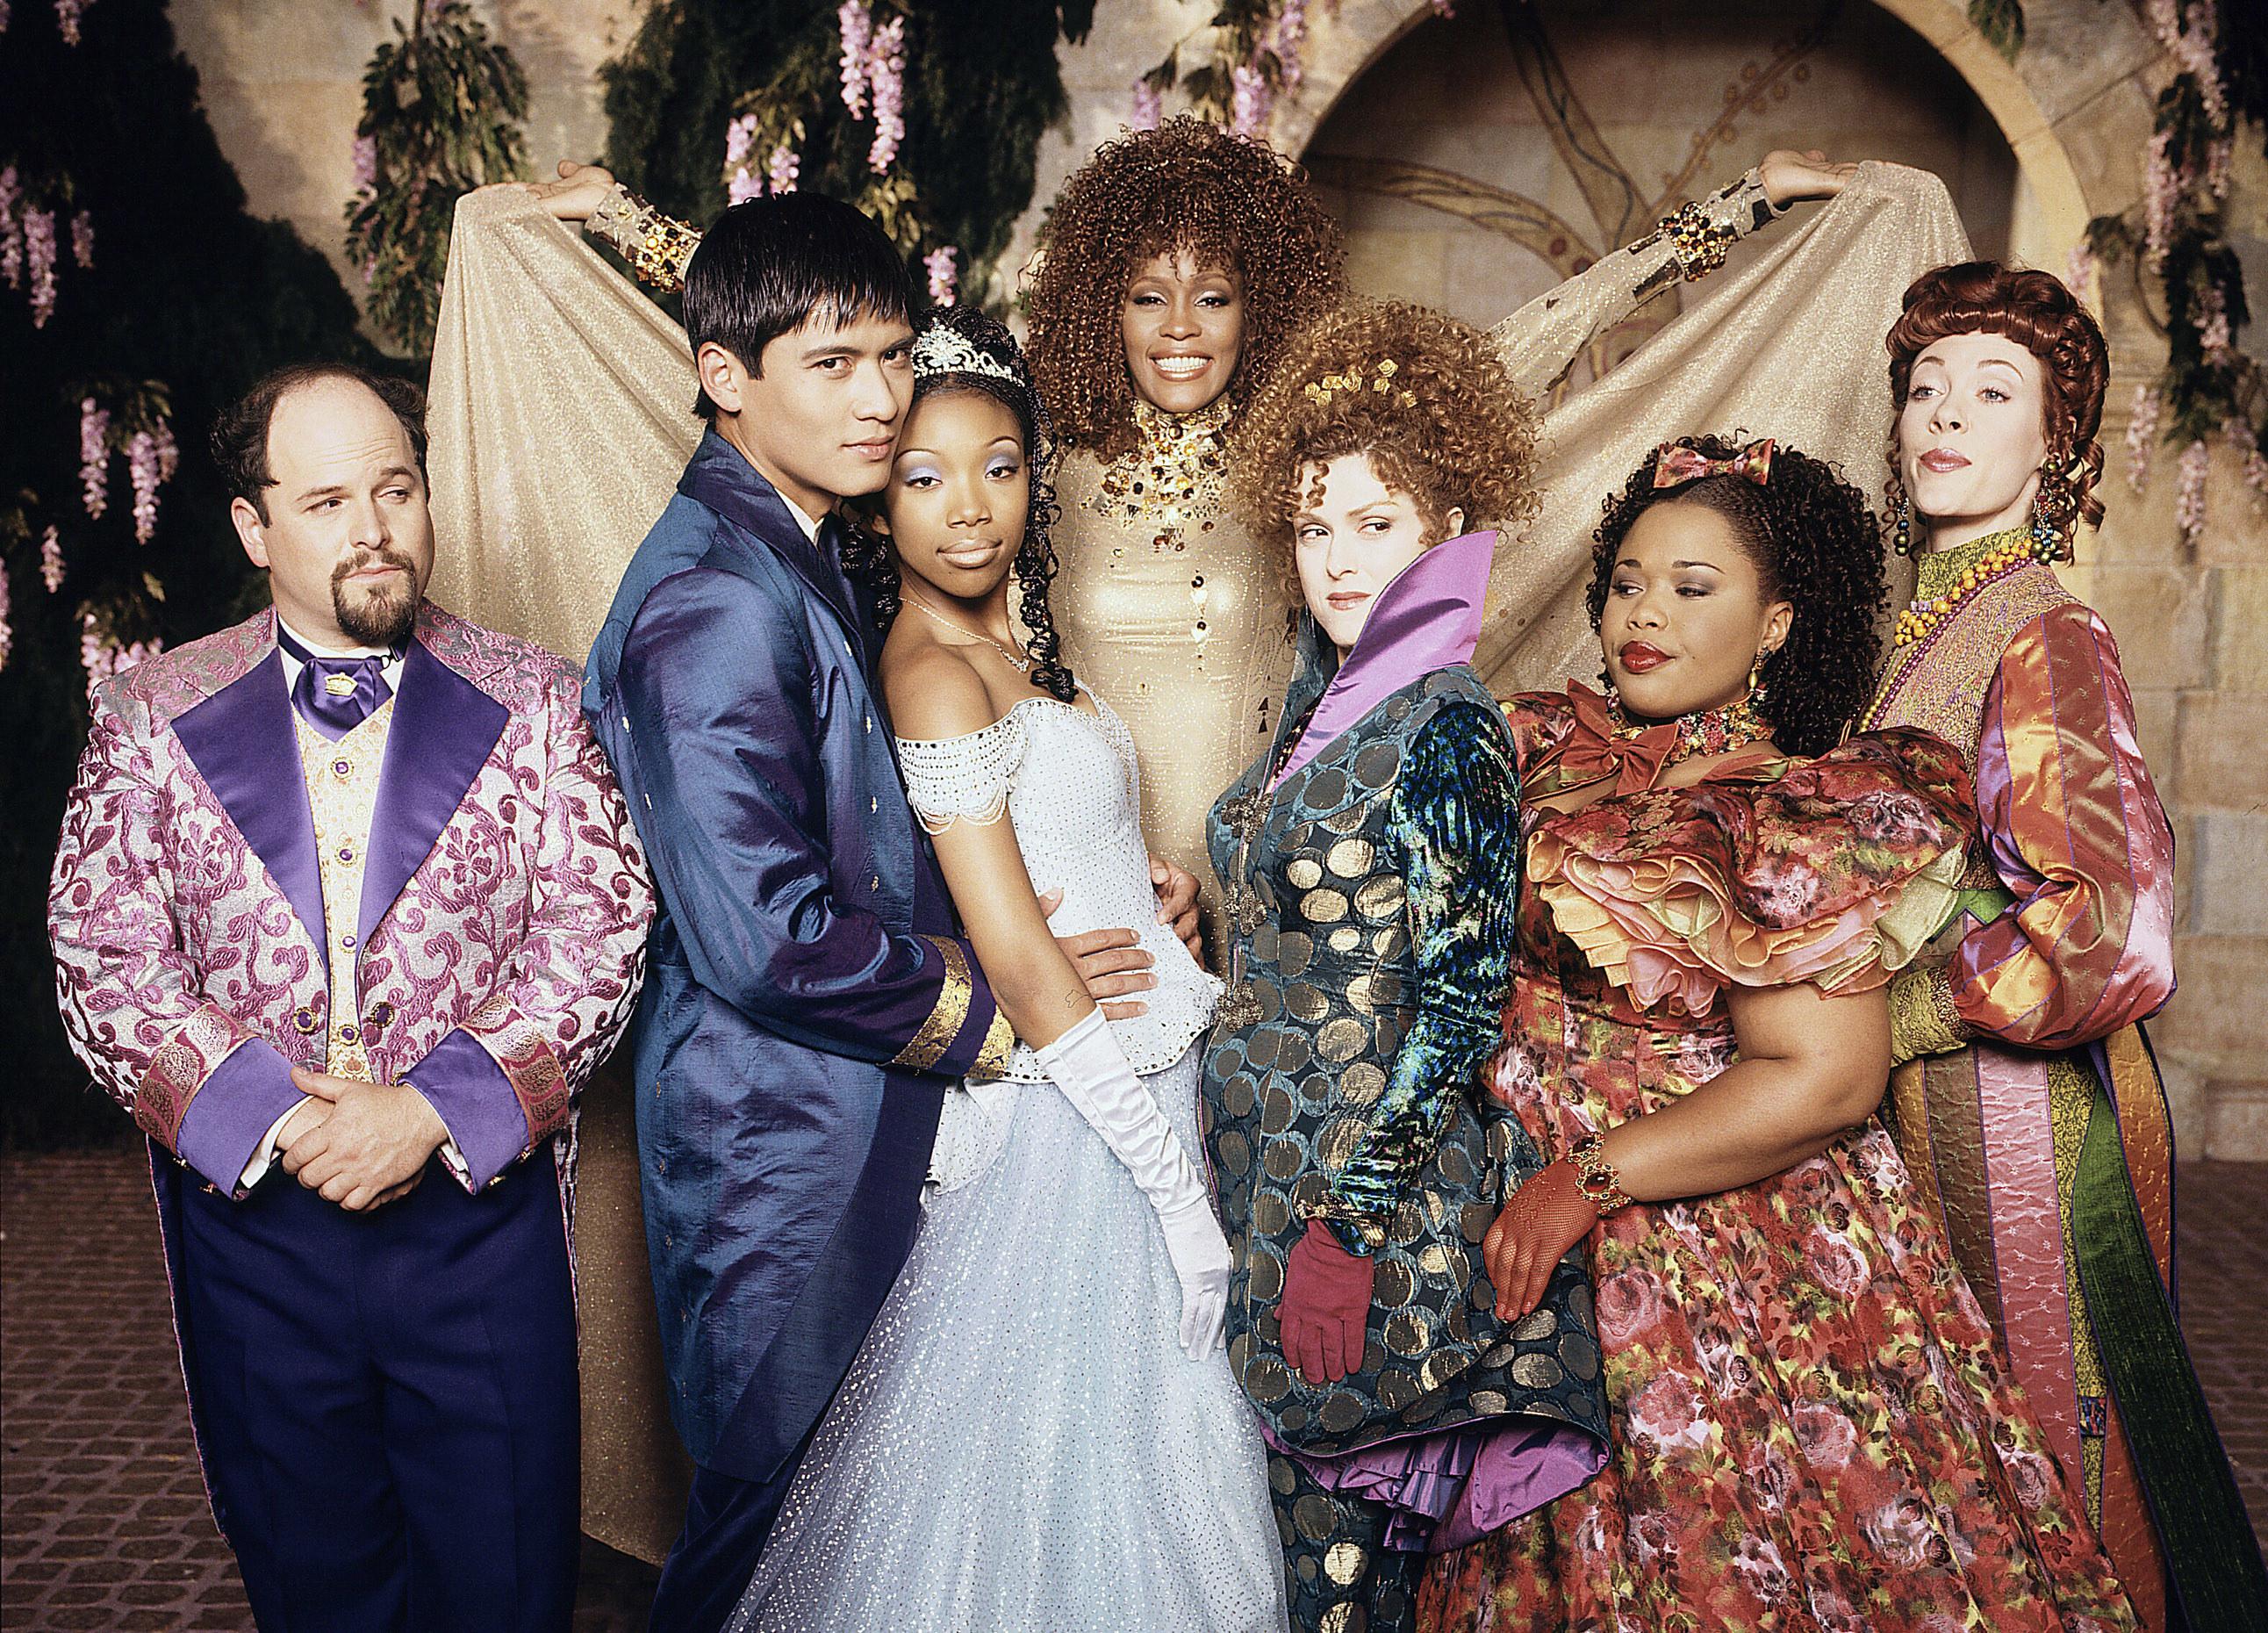 Cast of Cinderella